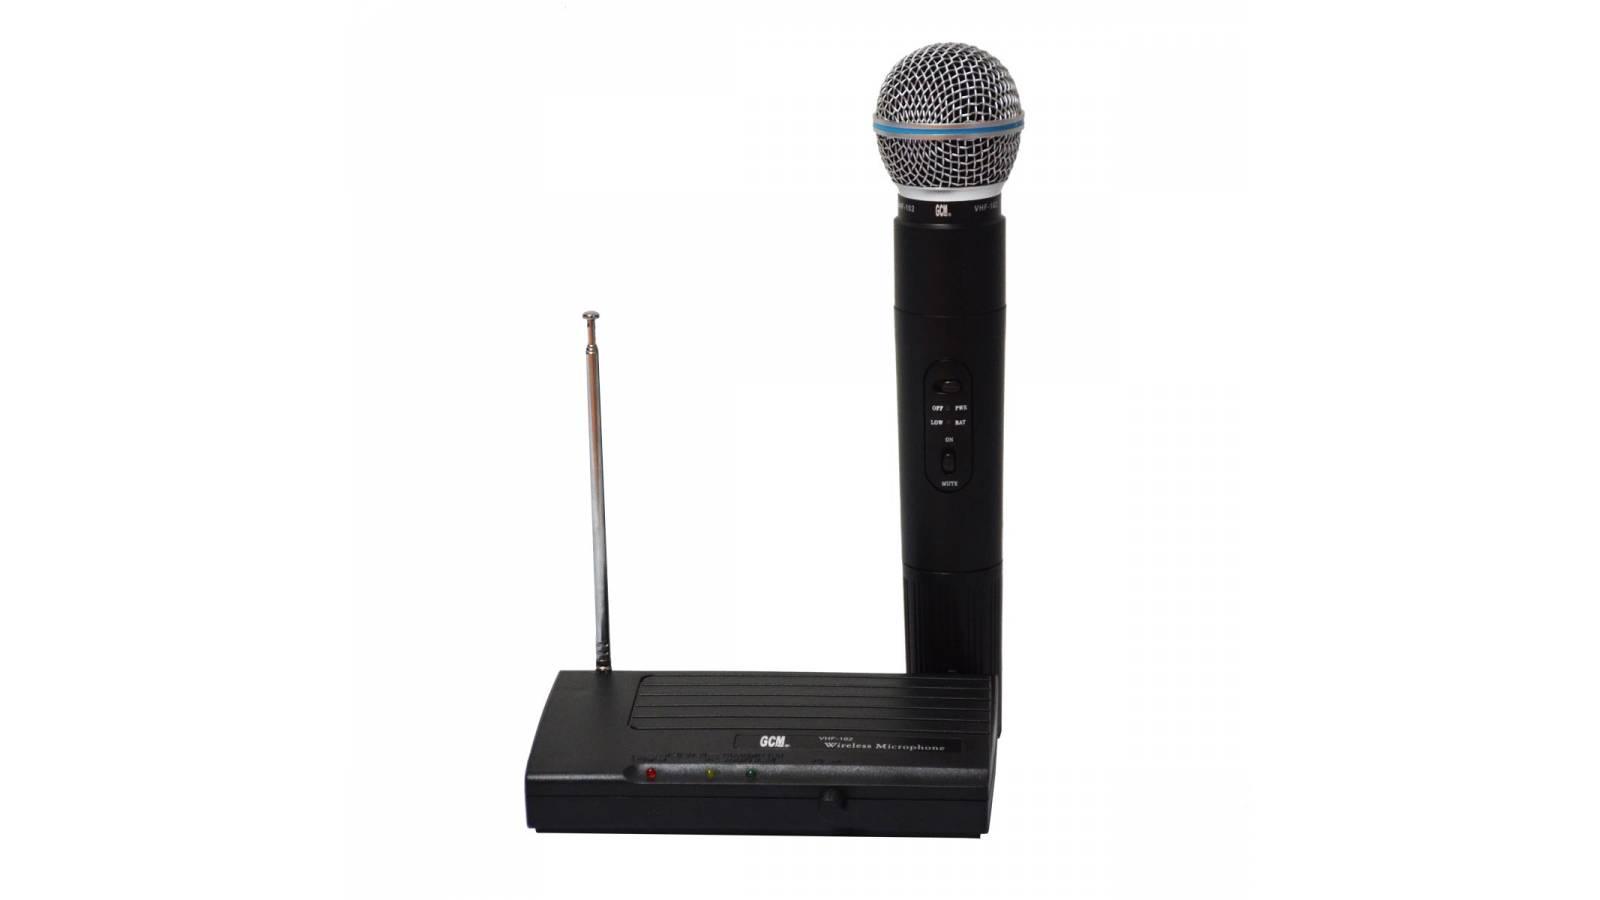 Micrófono Profesional de Mano Inalambrico G-102, 50M de Alcance!